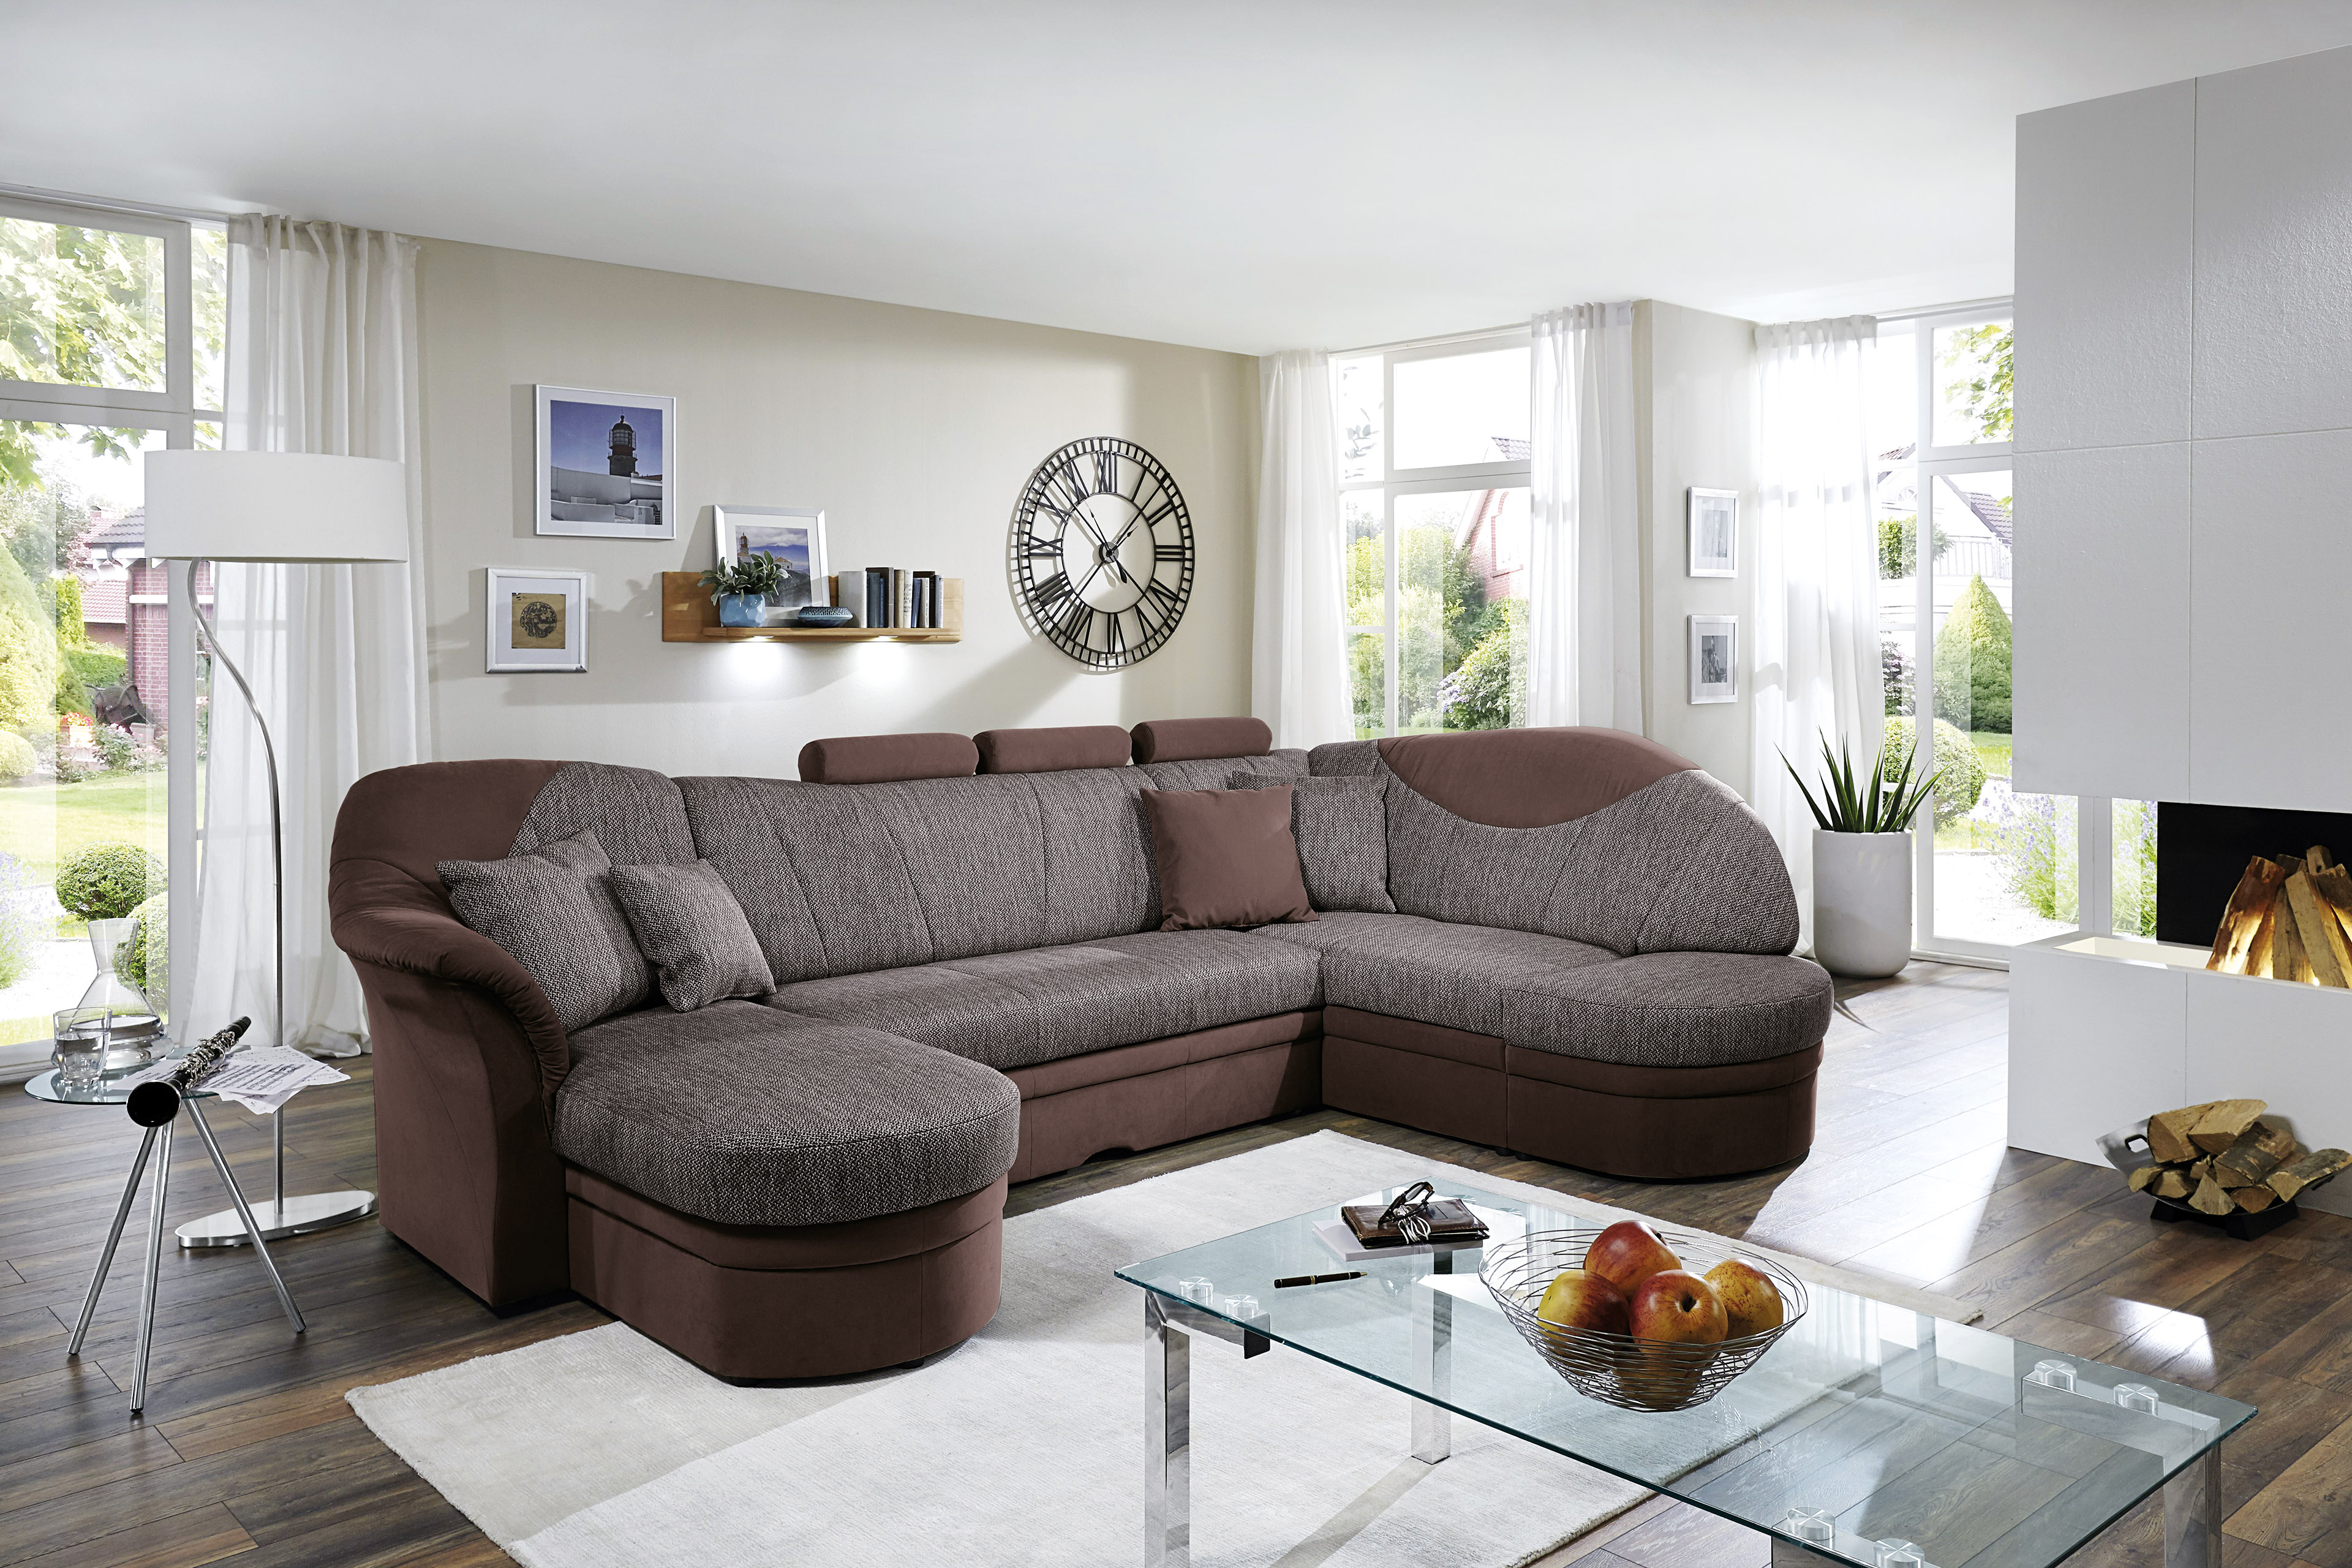 polipol esbo wohnlandschaft grau braun m bel letz ihr online shop. Black Bedroom Furniture Sets. Home Design Ideas